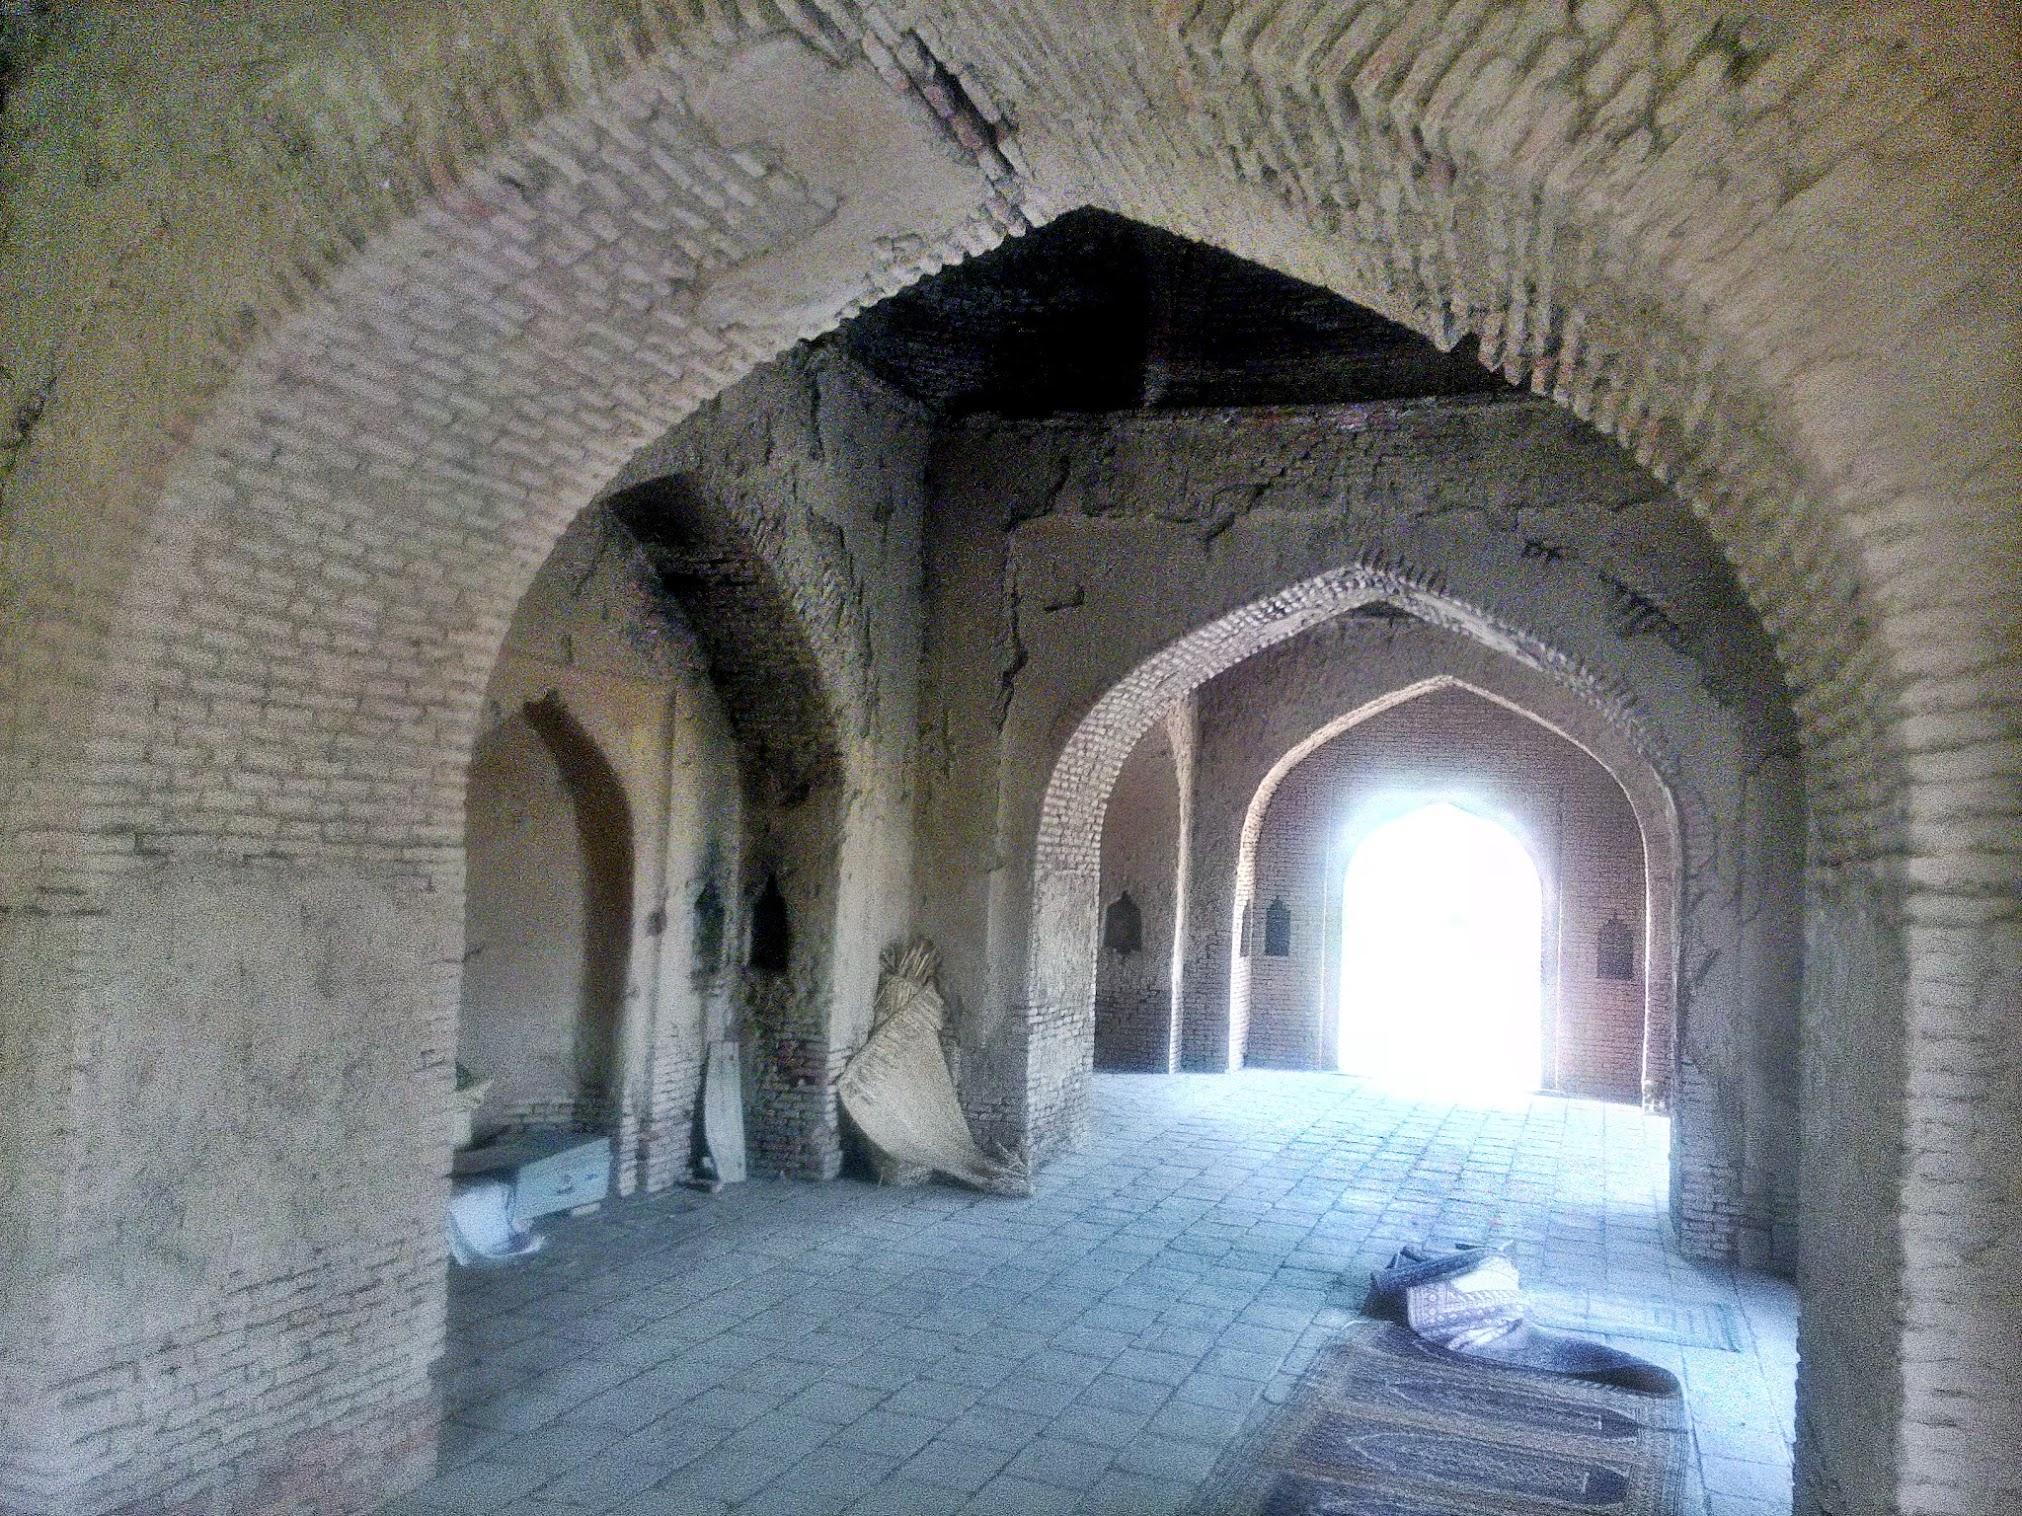 Interior - Arches